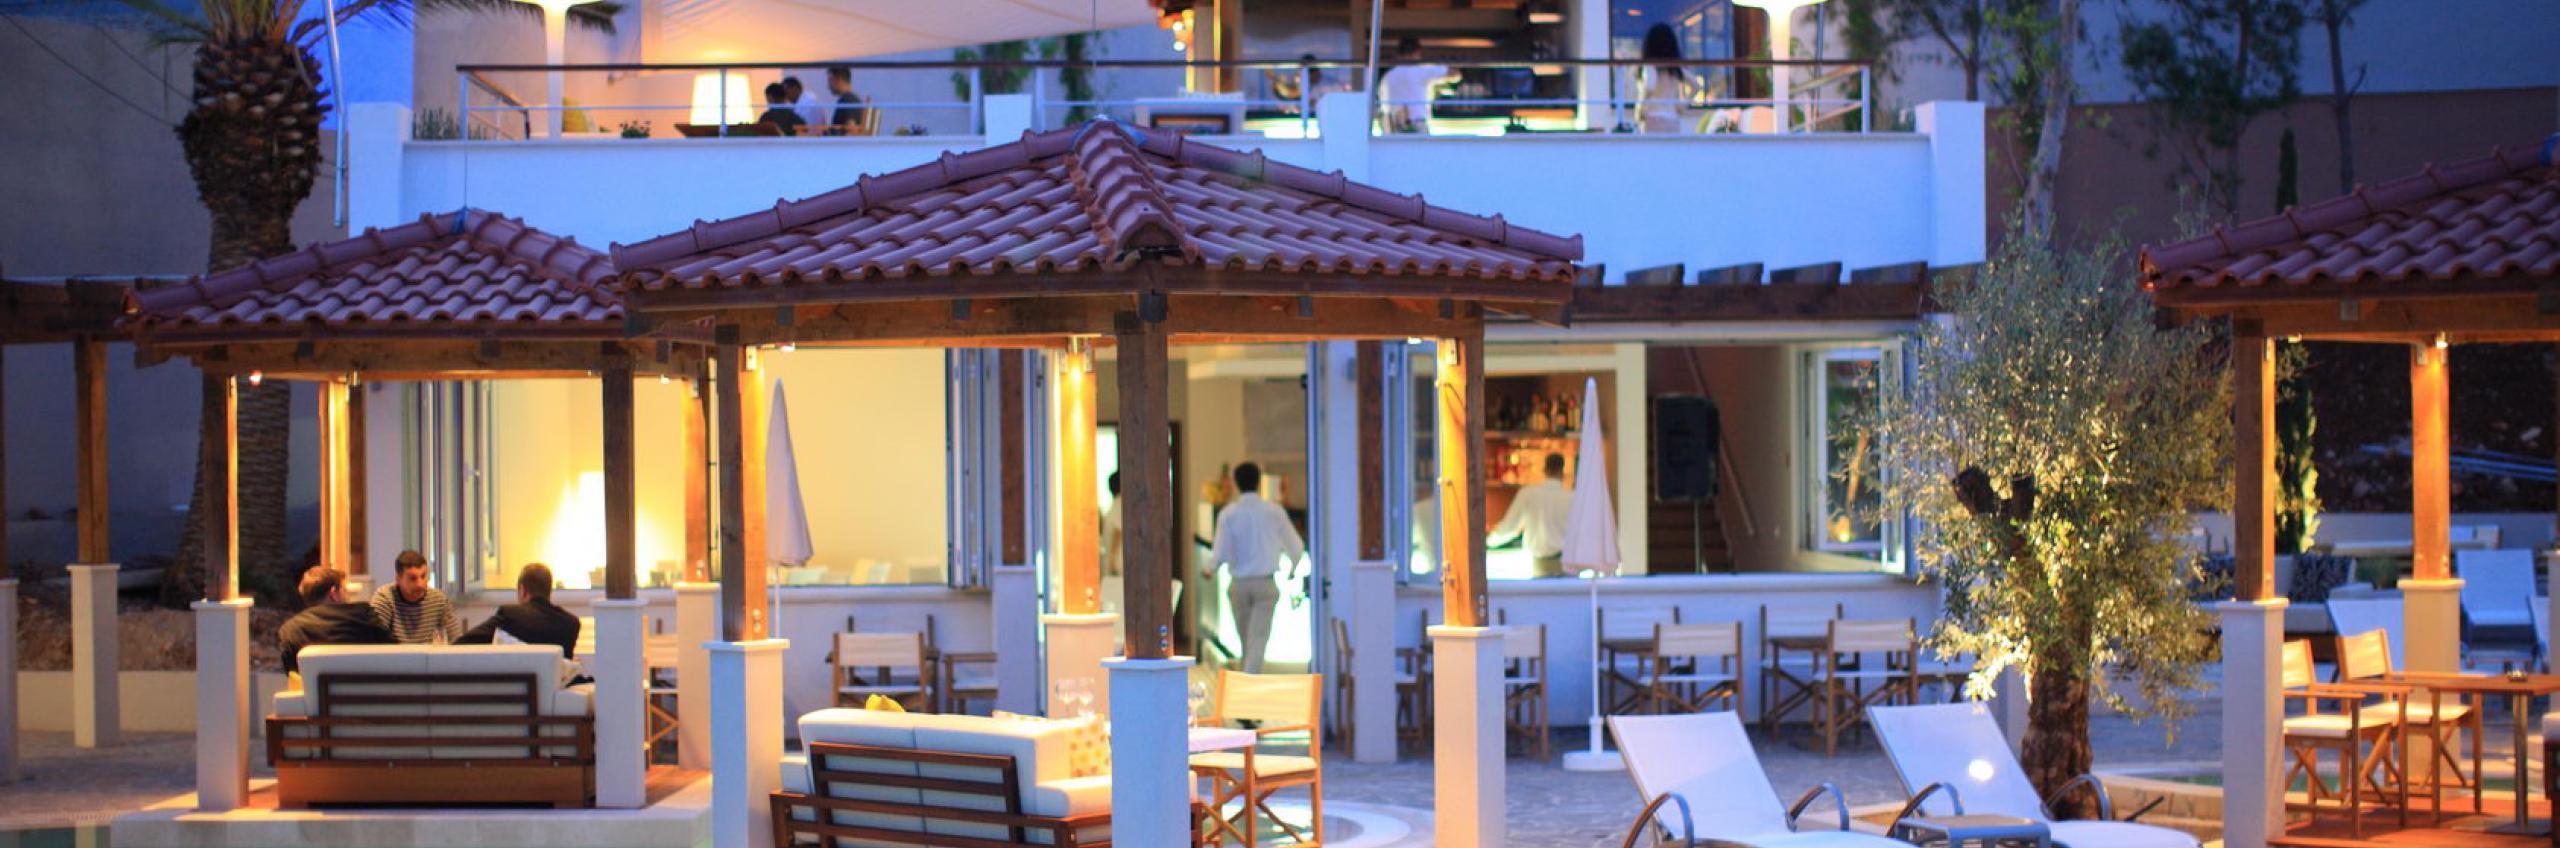 Hotel Villa Dalmacija Suncani Hvar